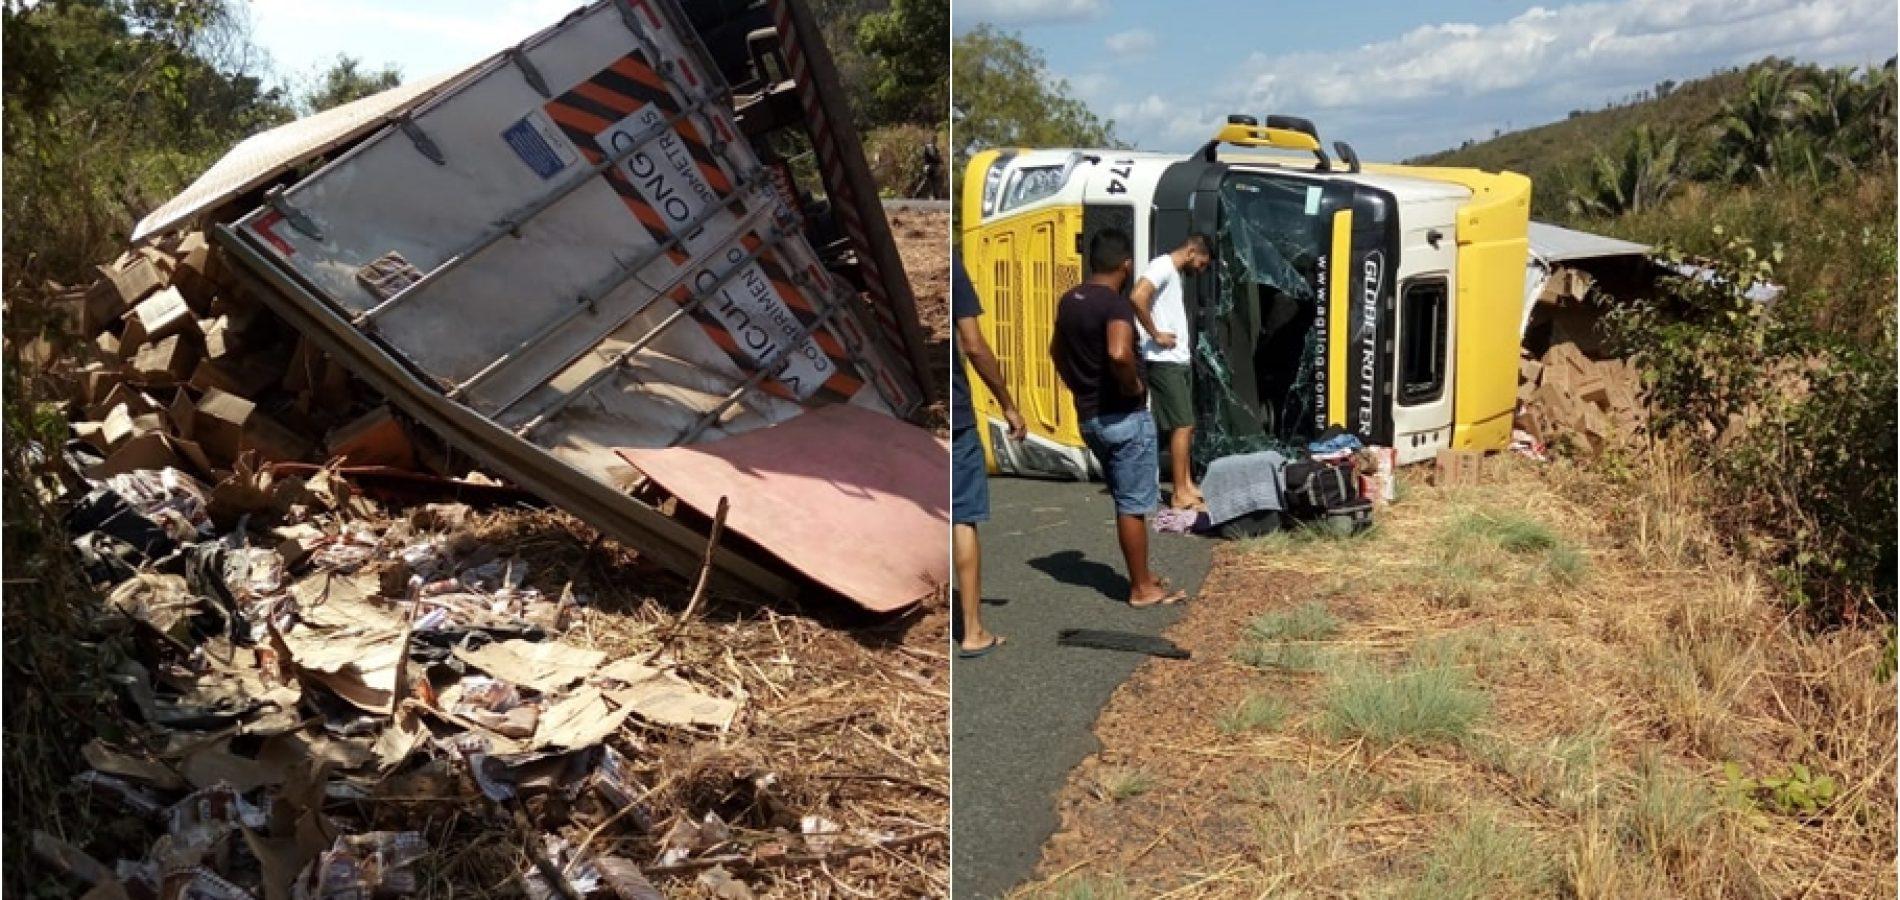 Caminhão carregado de biscoitos tomba e carga é saqueada na BR 316